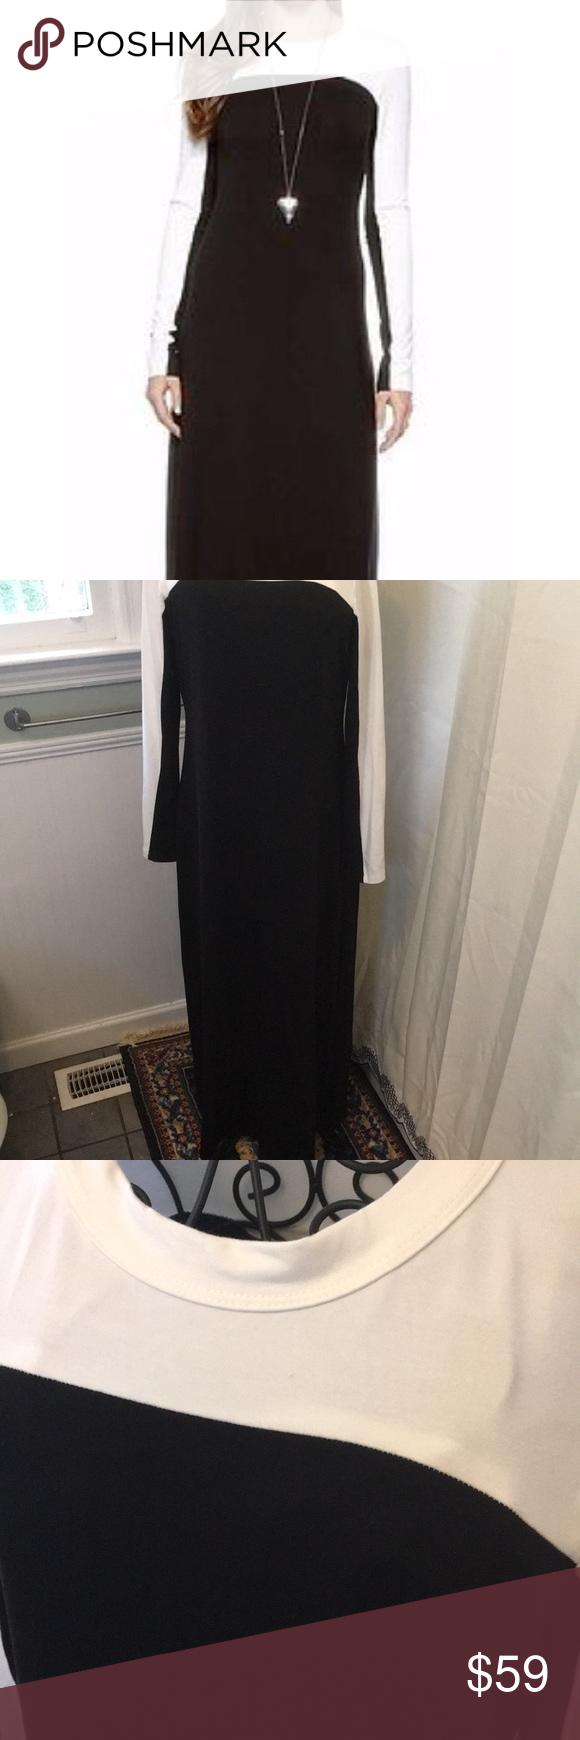 Karen Kane Maxi Colorblock Dress Sz L Color Block Maxi Dress Colorblock Dress Karen Kane Dress [ 1740 x 580 Pixel ]